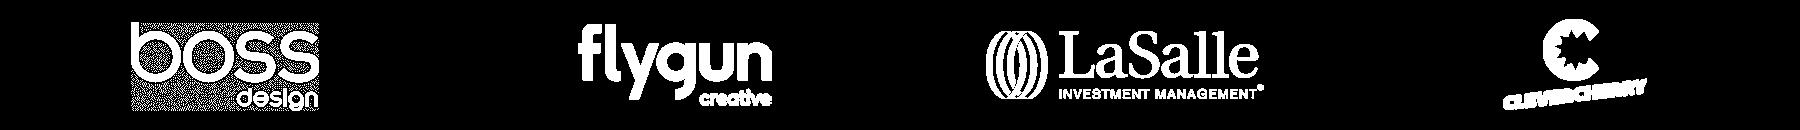 Client Logos 6